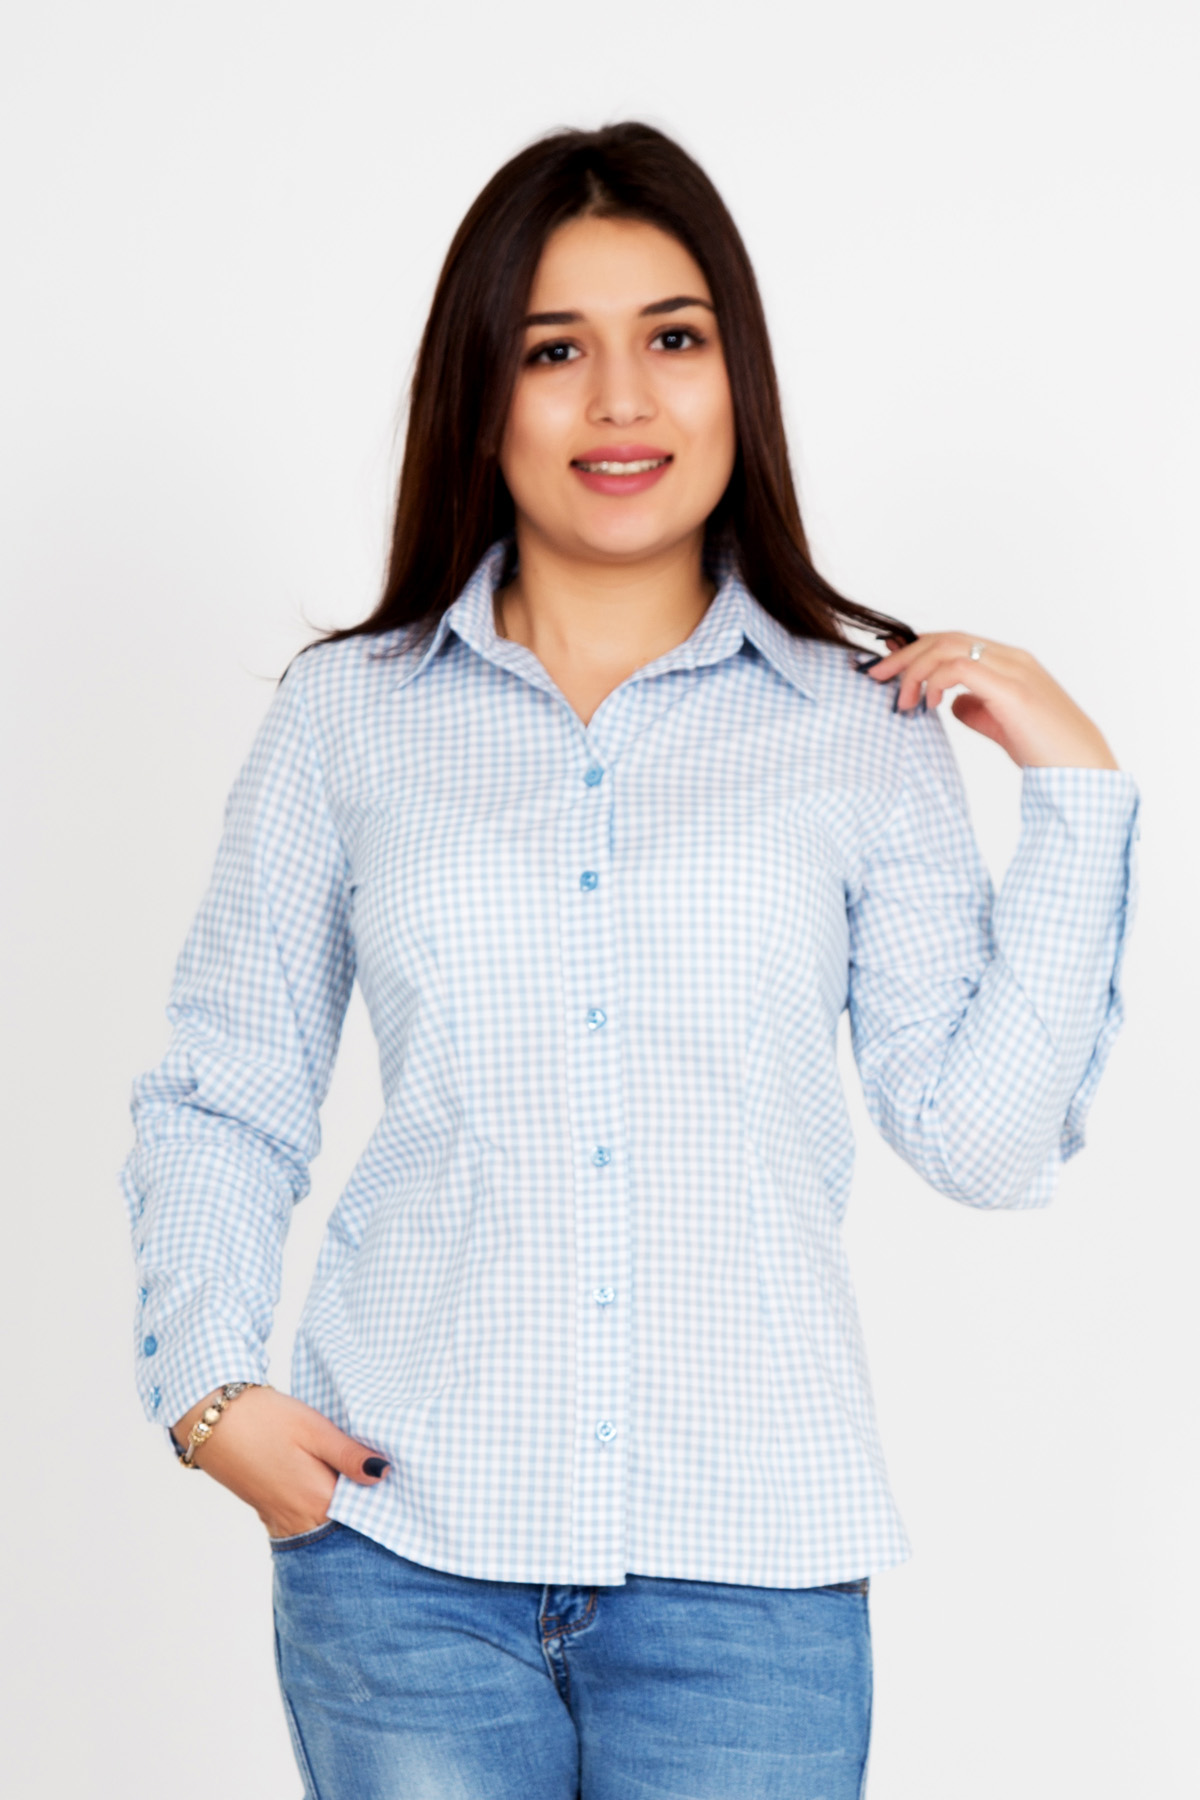 Жен. рубашка Герти р. 44Рубашки<br>Обхват груди: 88 см <br>Обхват талии: 68 см <br>Обхват бедер: 96 см <br>Длина по спинке: 65 см <br>Рост: 167 см<br><br>Тип: Жен. рубашка<br>Размер: 44<br>Материал: Шотландка